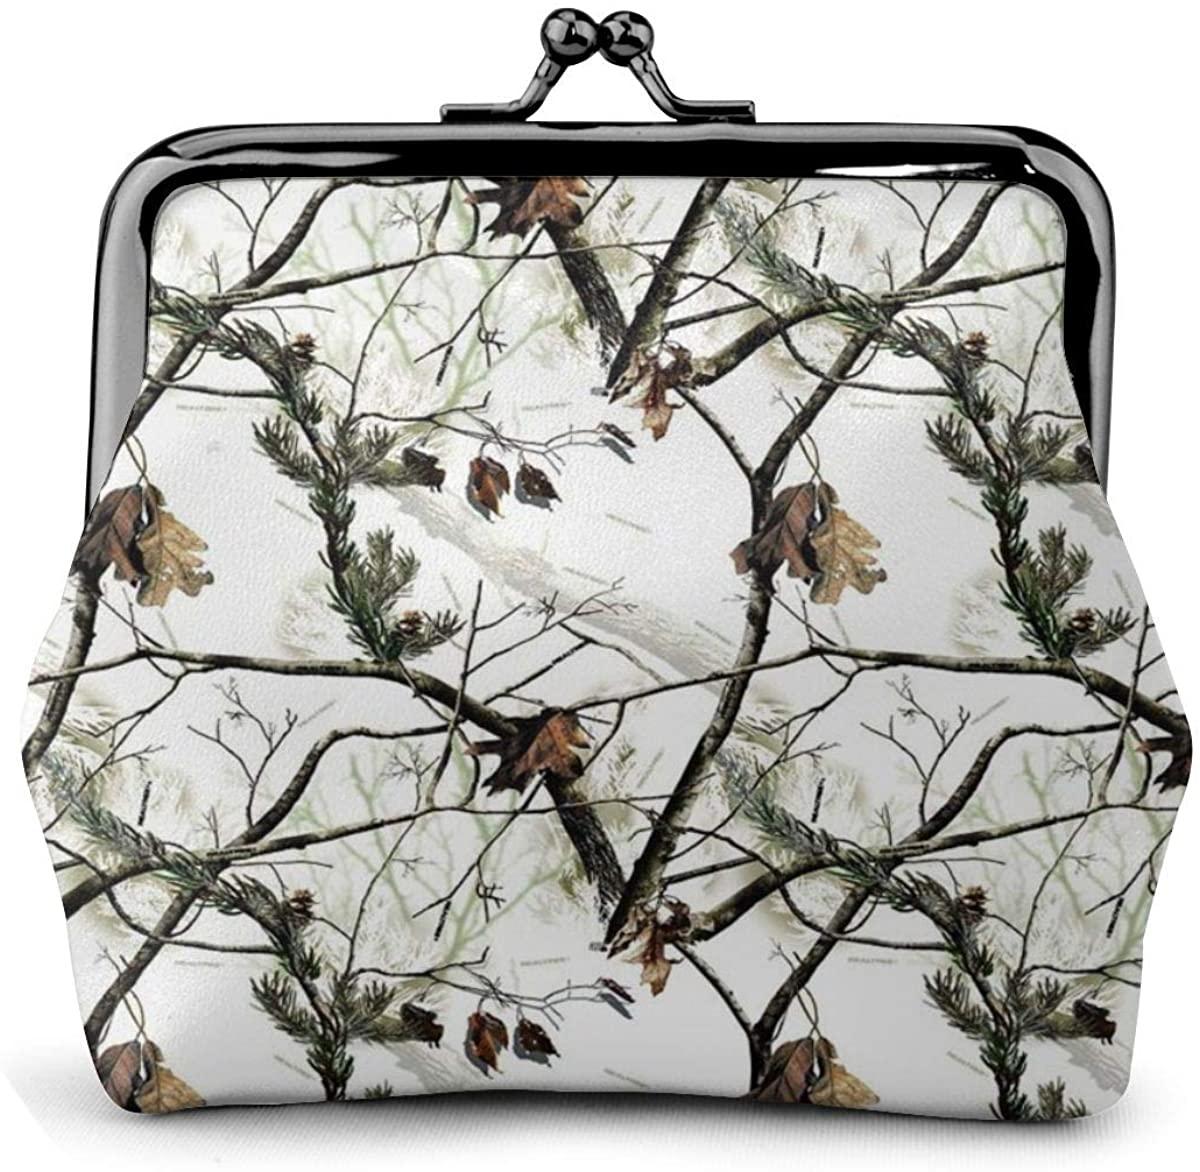 Women's Wallet White Realtree Camo Coin Purse Kiss-Lock Buckle Coin Pouch Mini Travel Cash Cards Bag